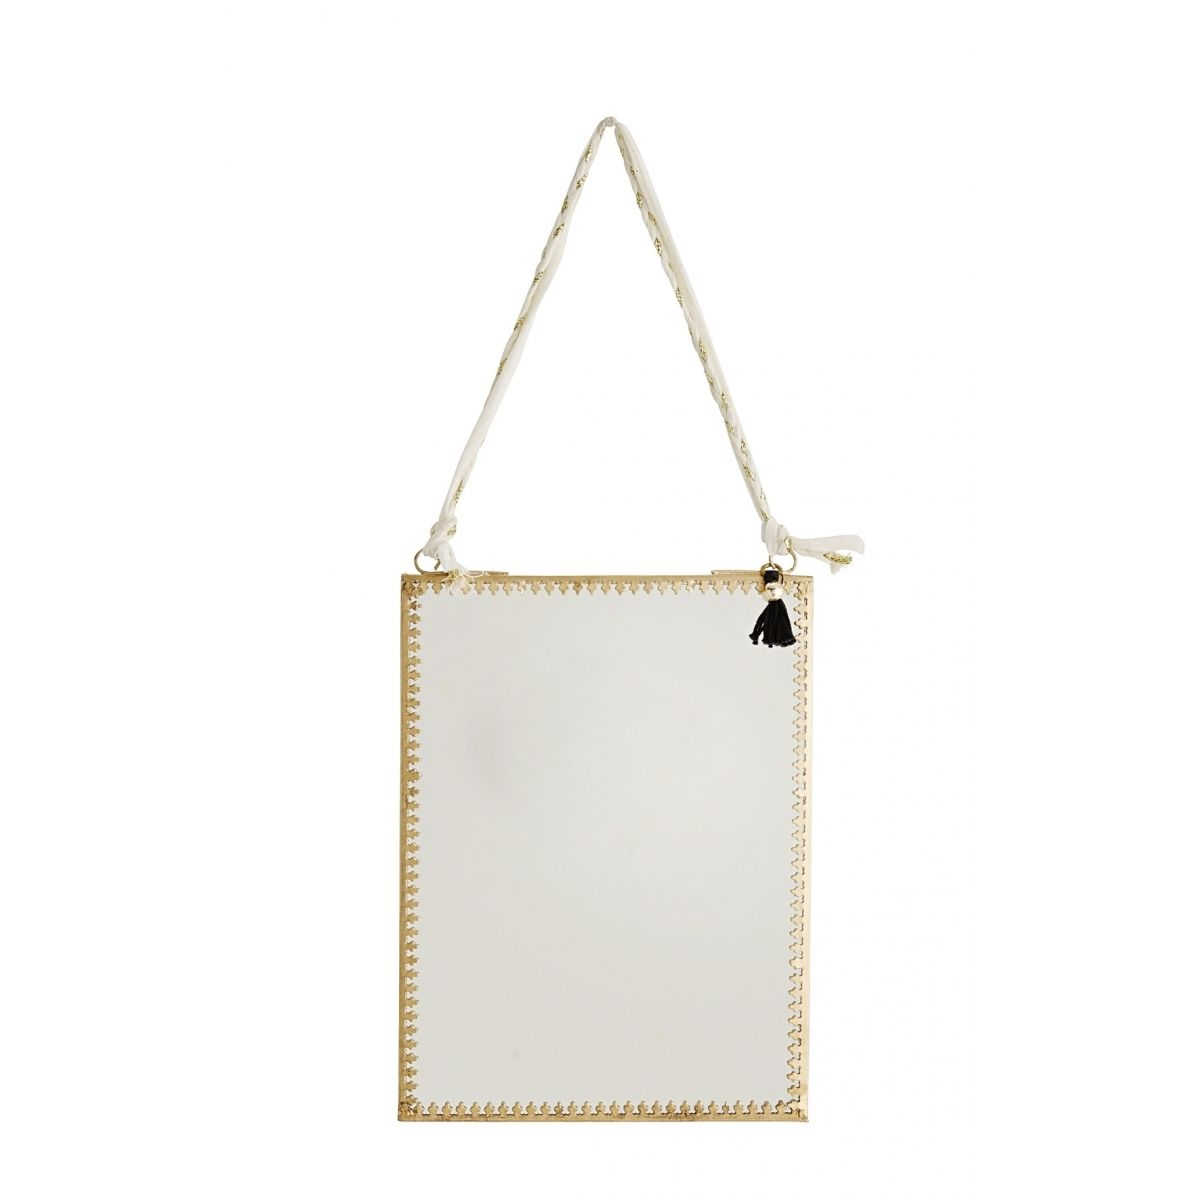 fd4e69a1d5e Madam Stoltz | Hanging mirror gold 15x20 cm | SS19 Color Gold Size ...